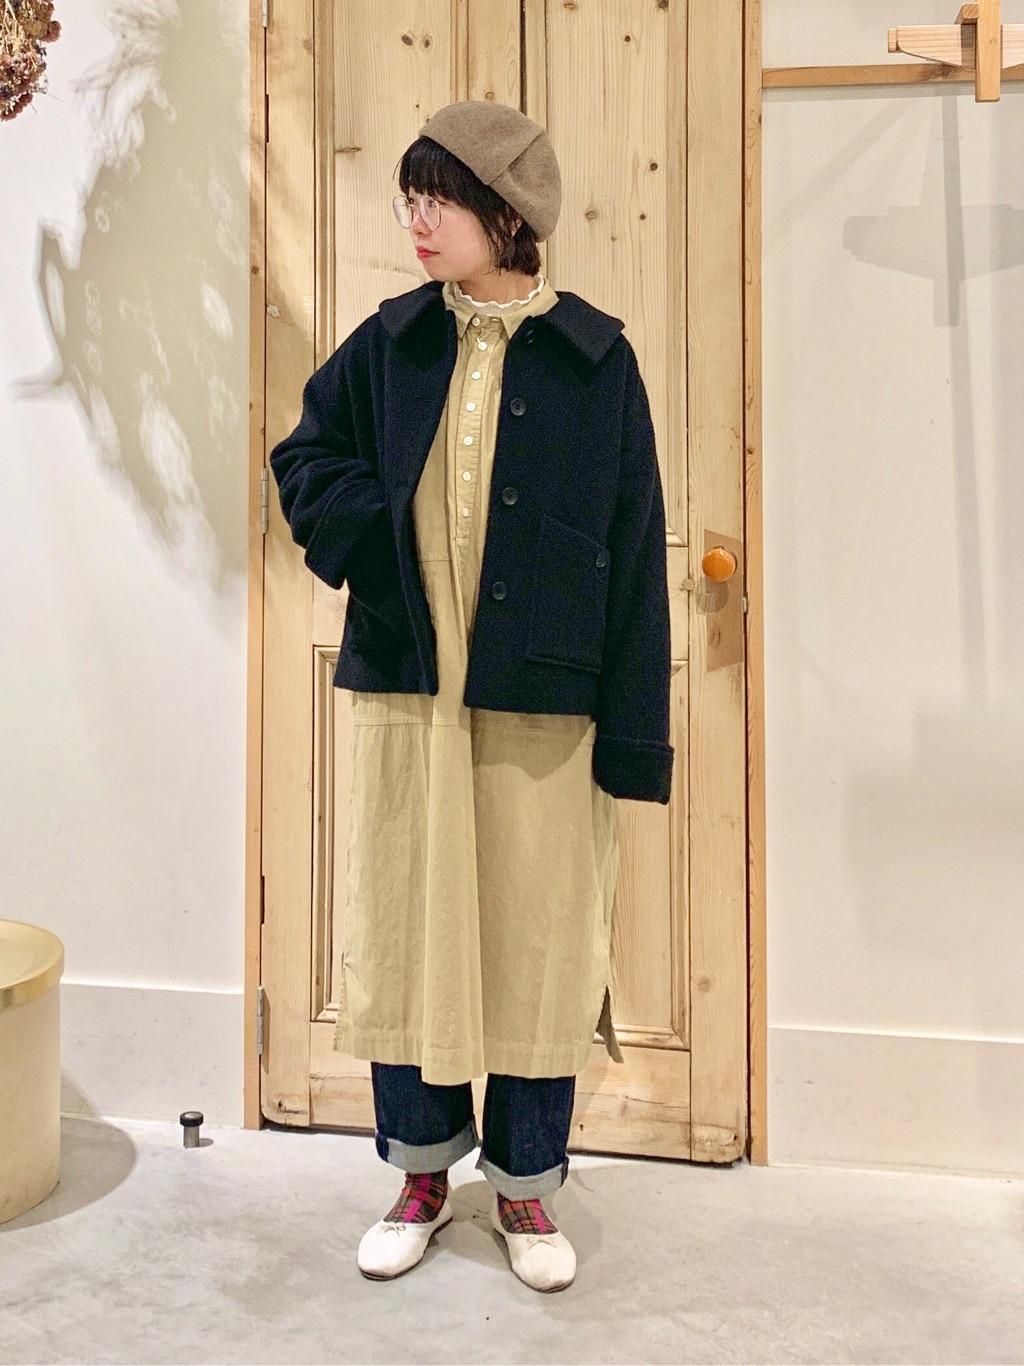 Malle chambre de charme 調布パルコ 身長:153cm 2020.12.22